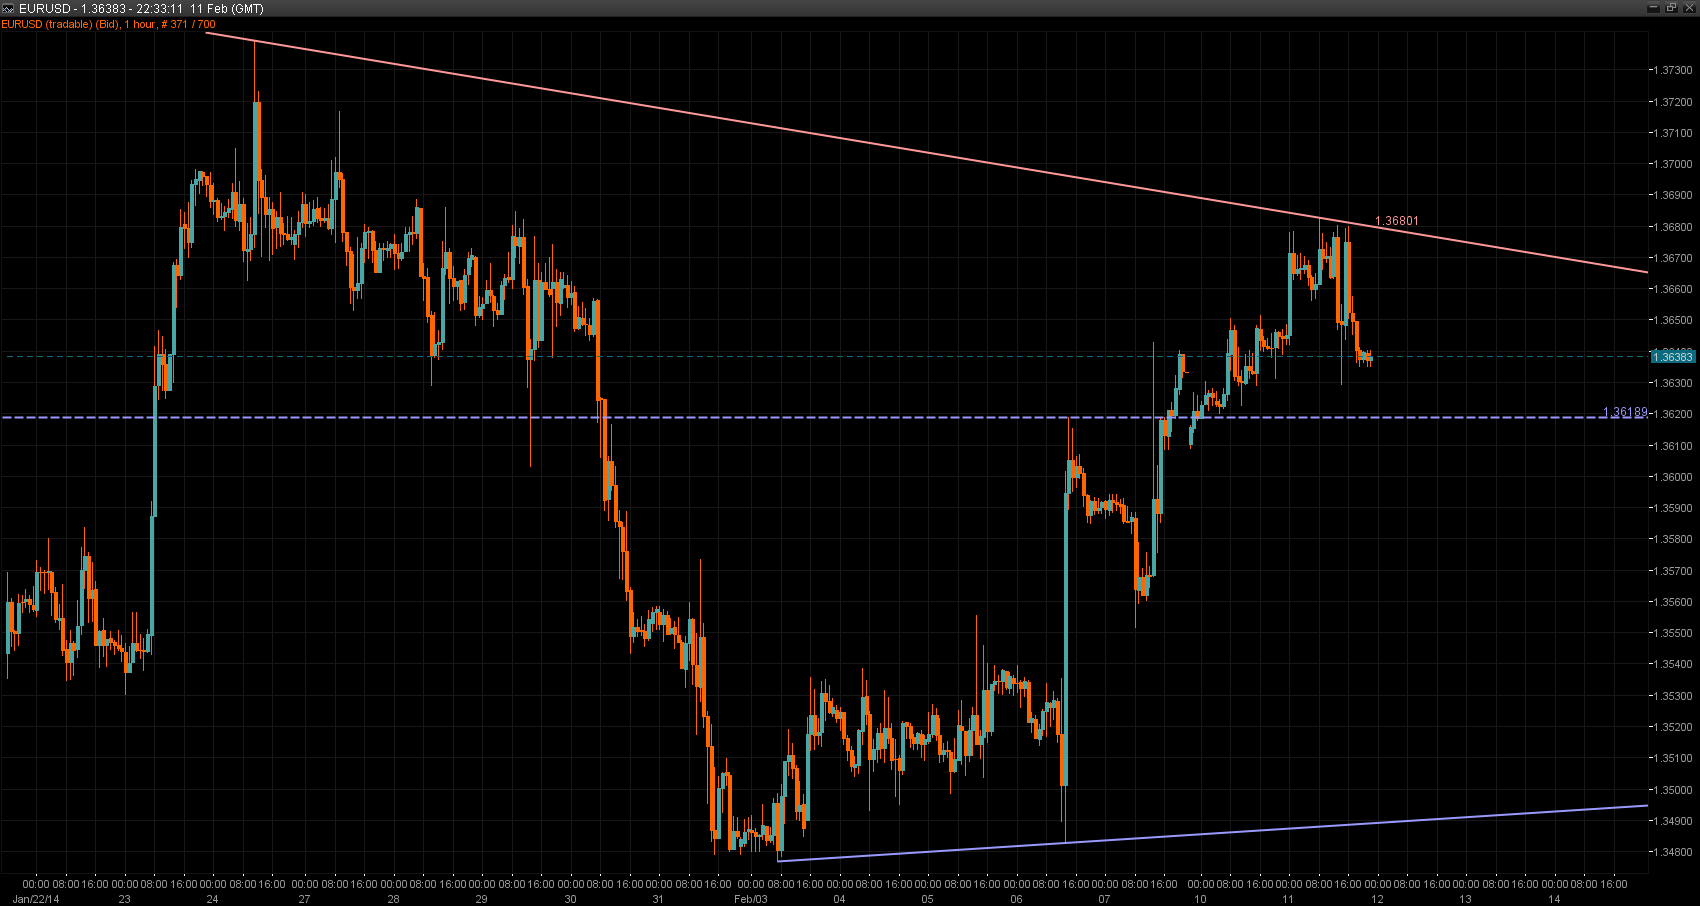 EUR/USD Chart 12 Feb 2014